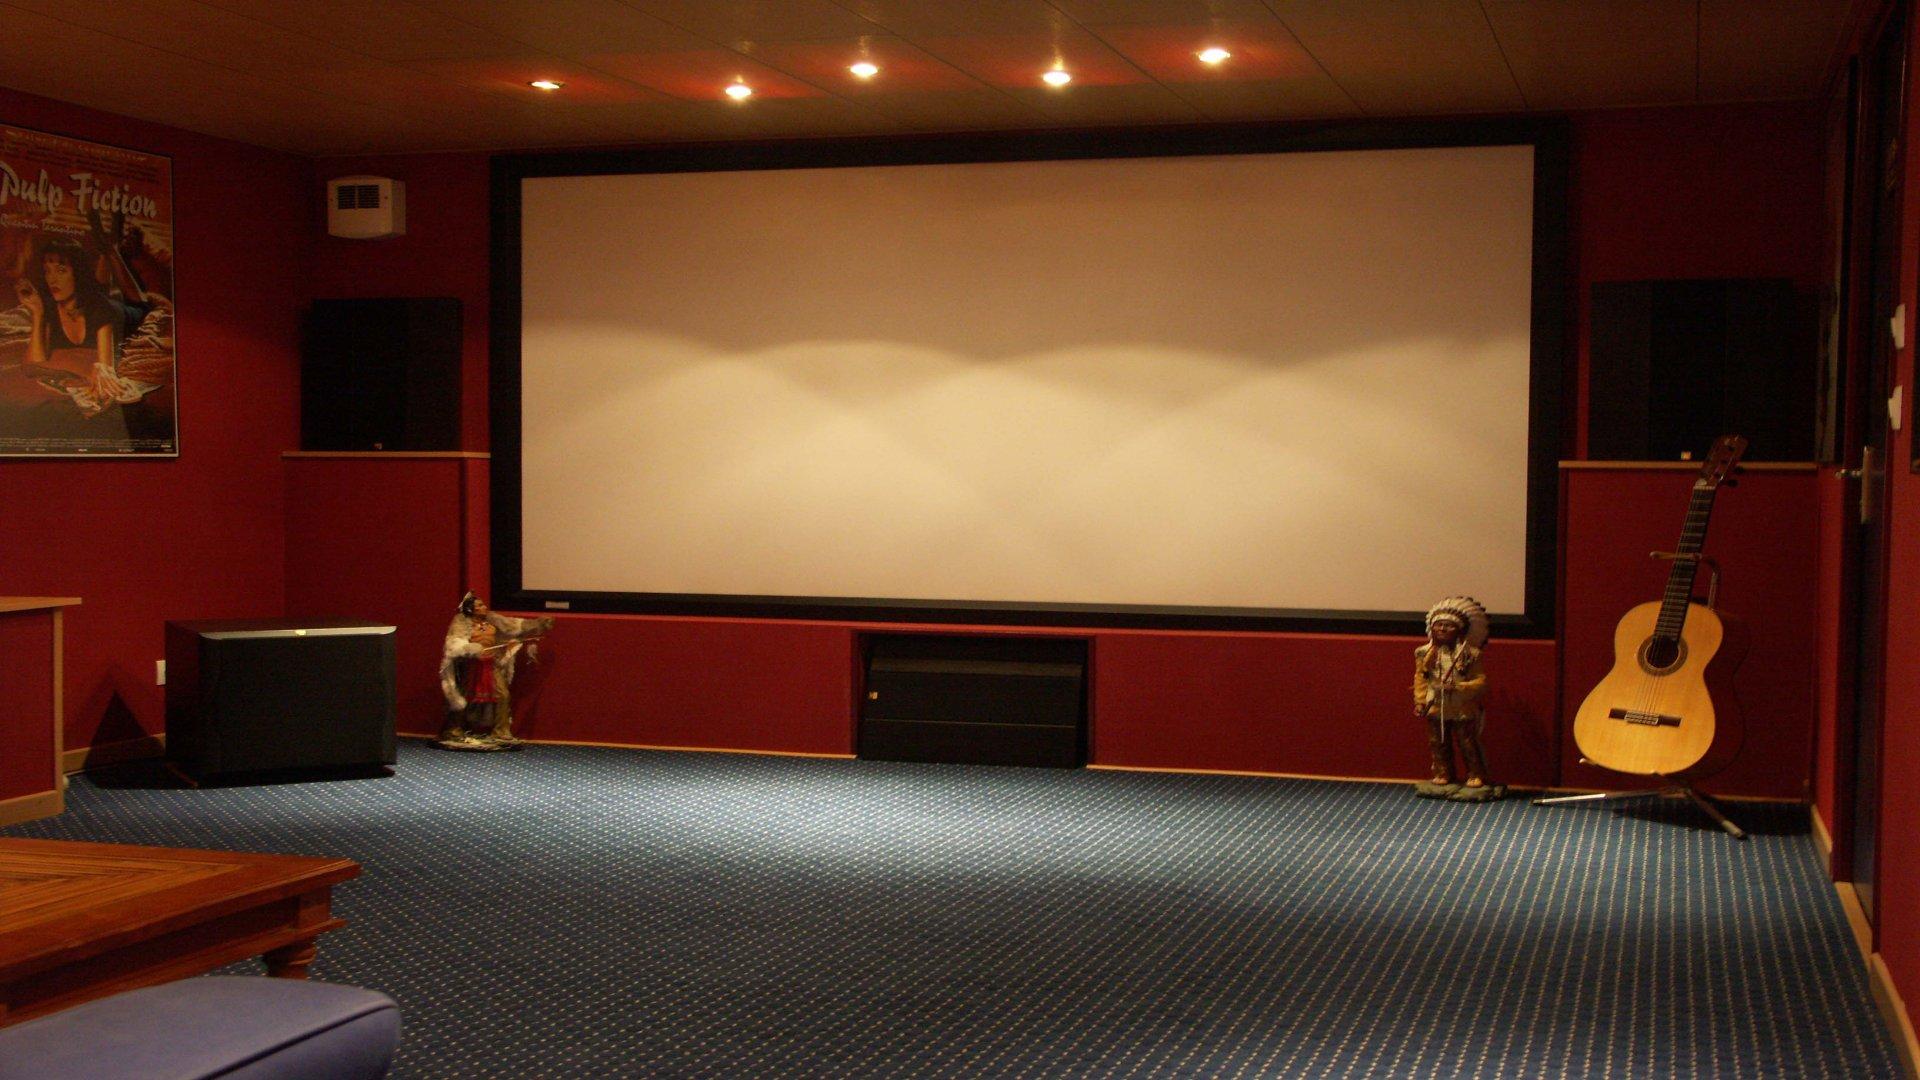 home theatre wallpaper free - photo #8